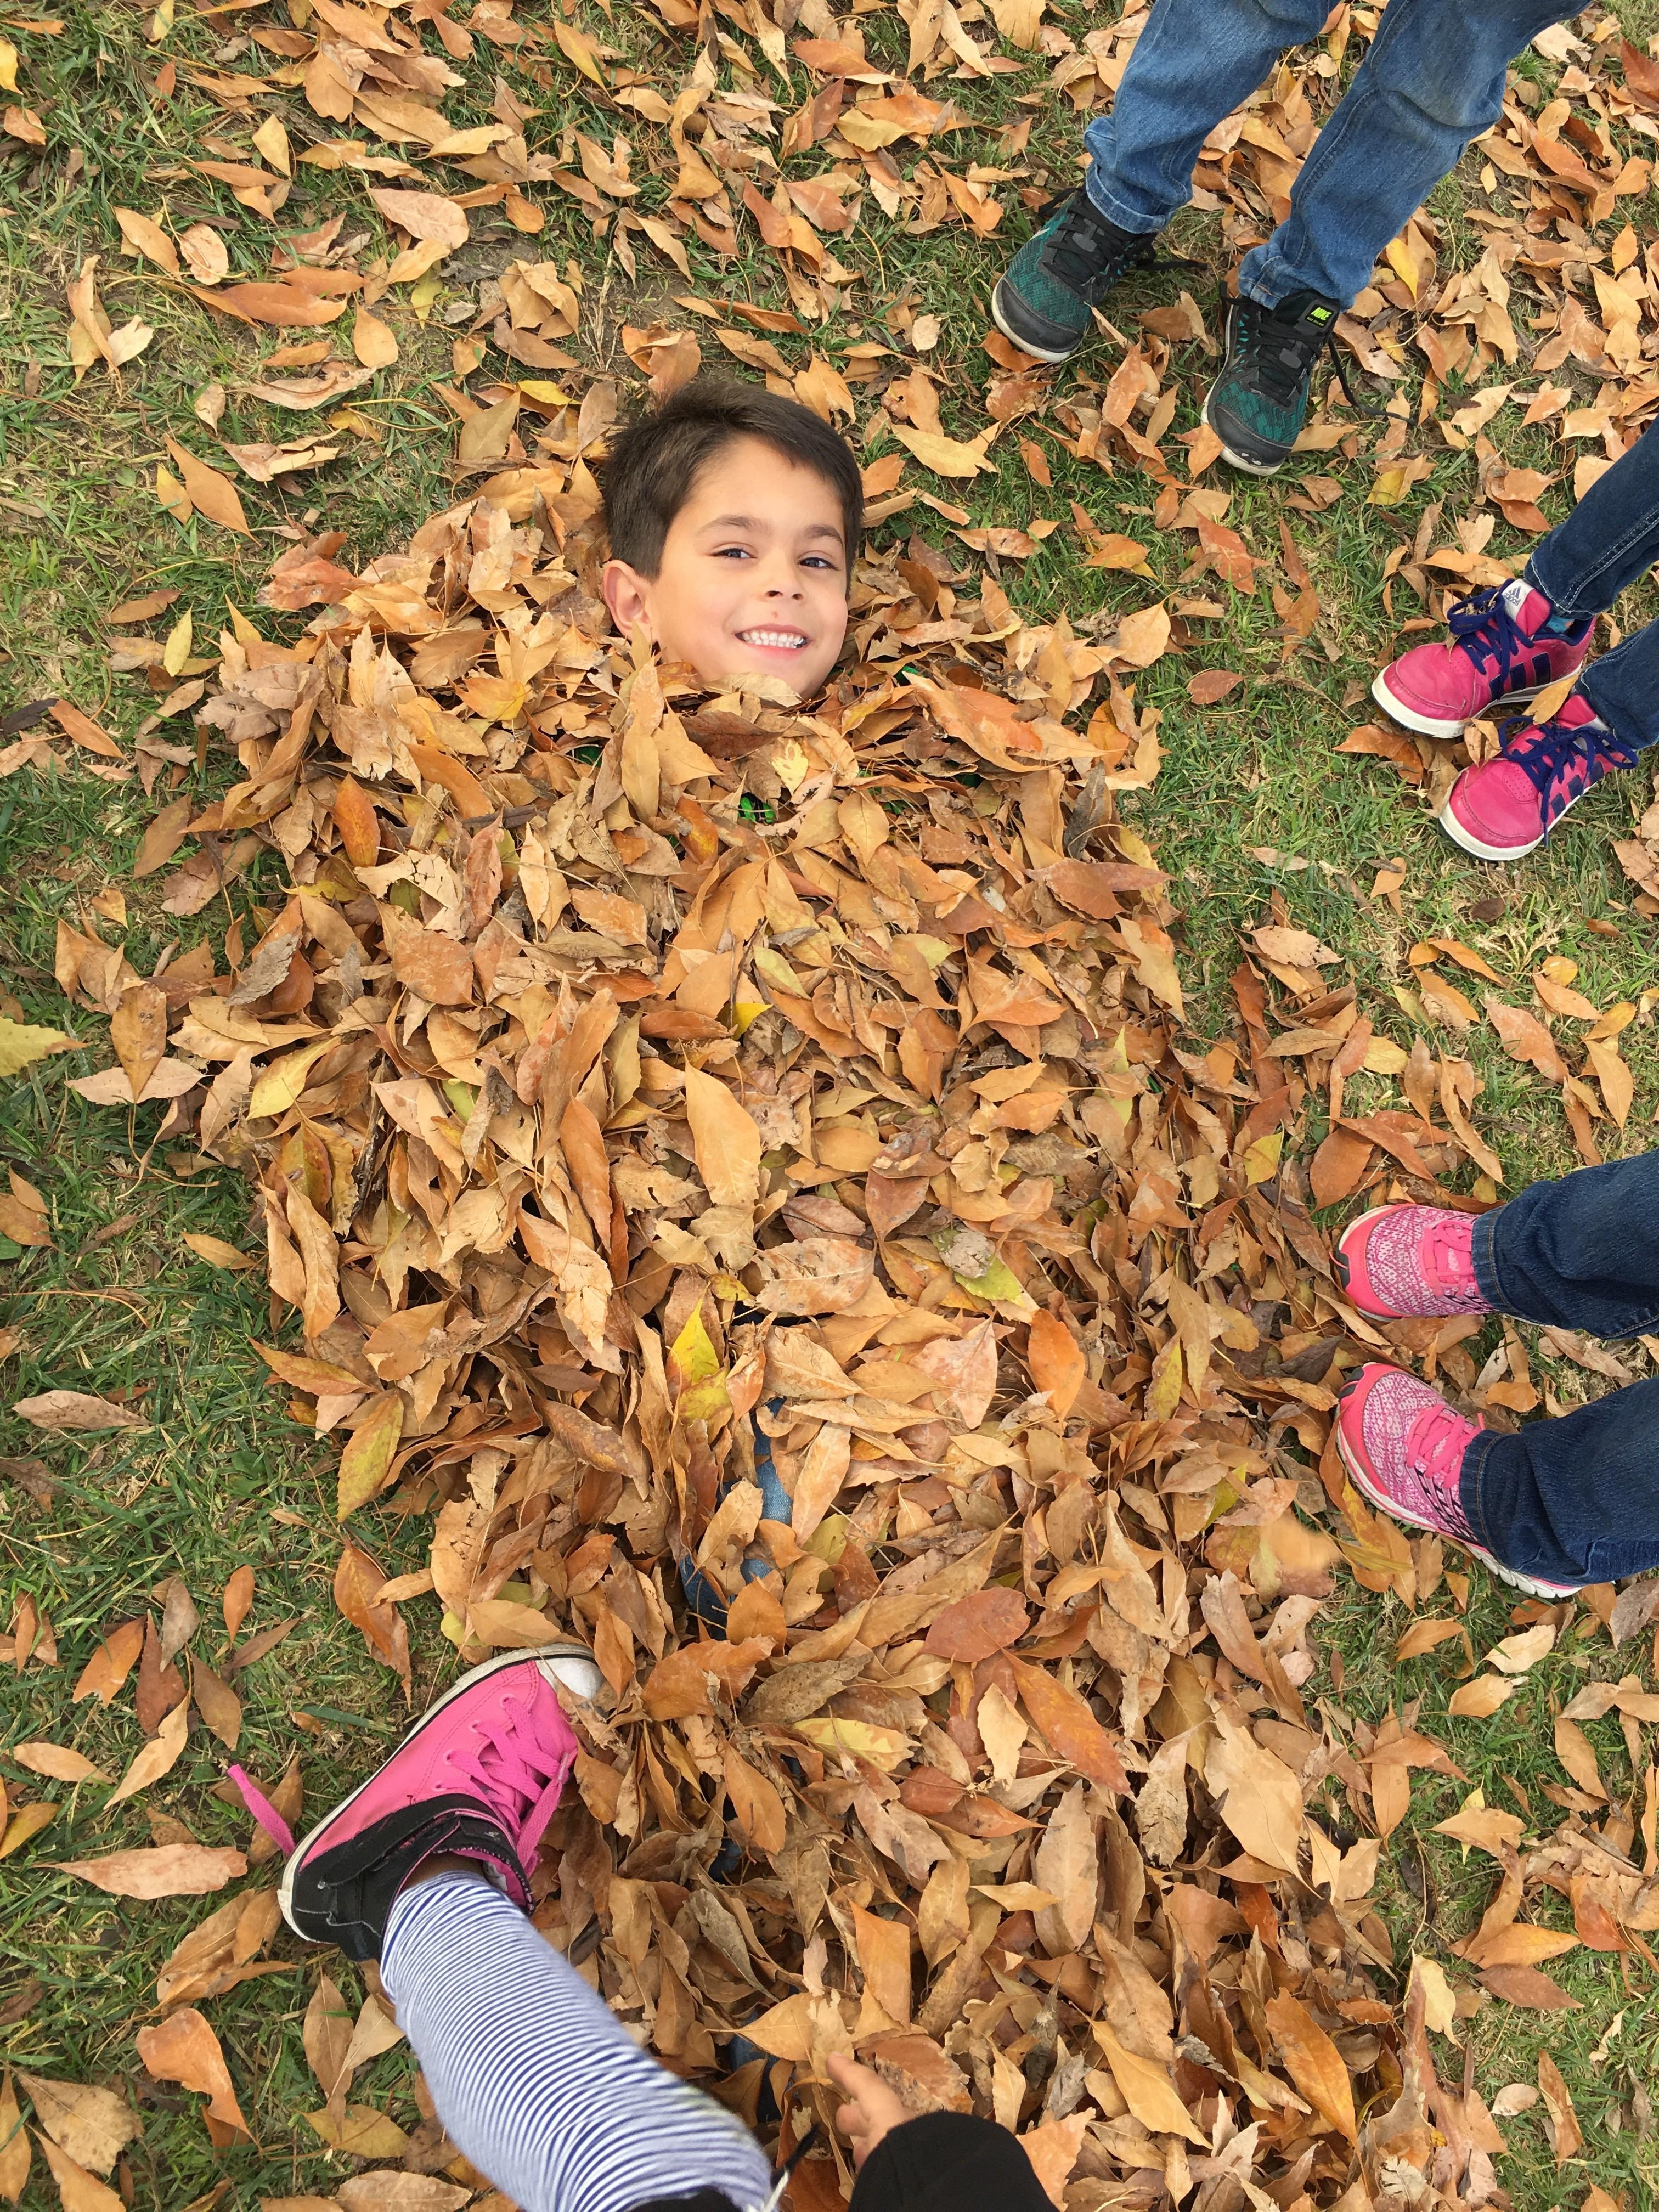 Kindergarten Fun in the Leaves